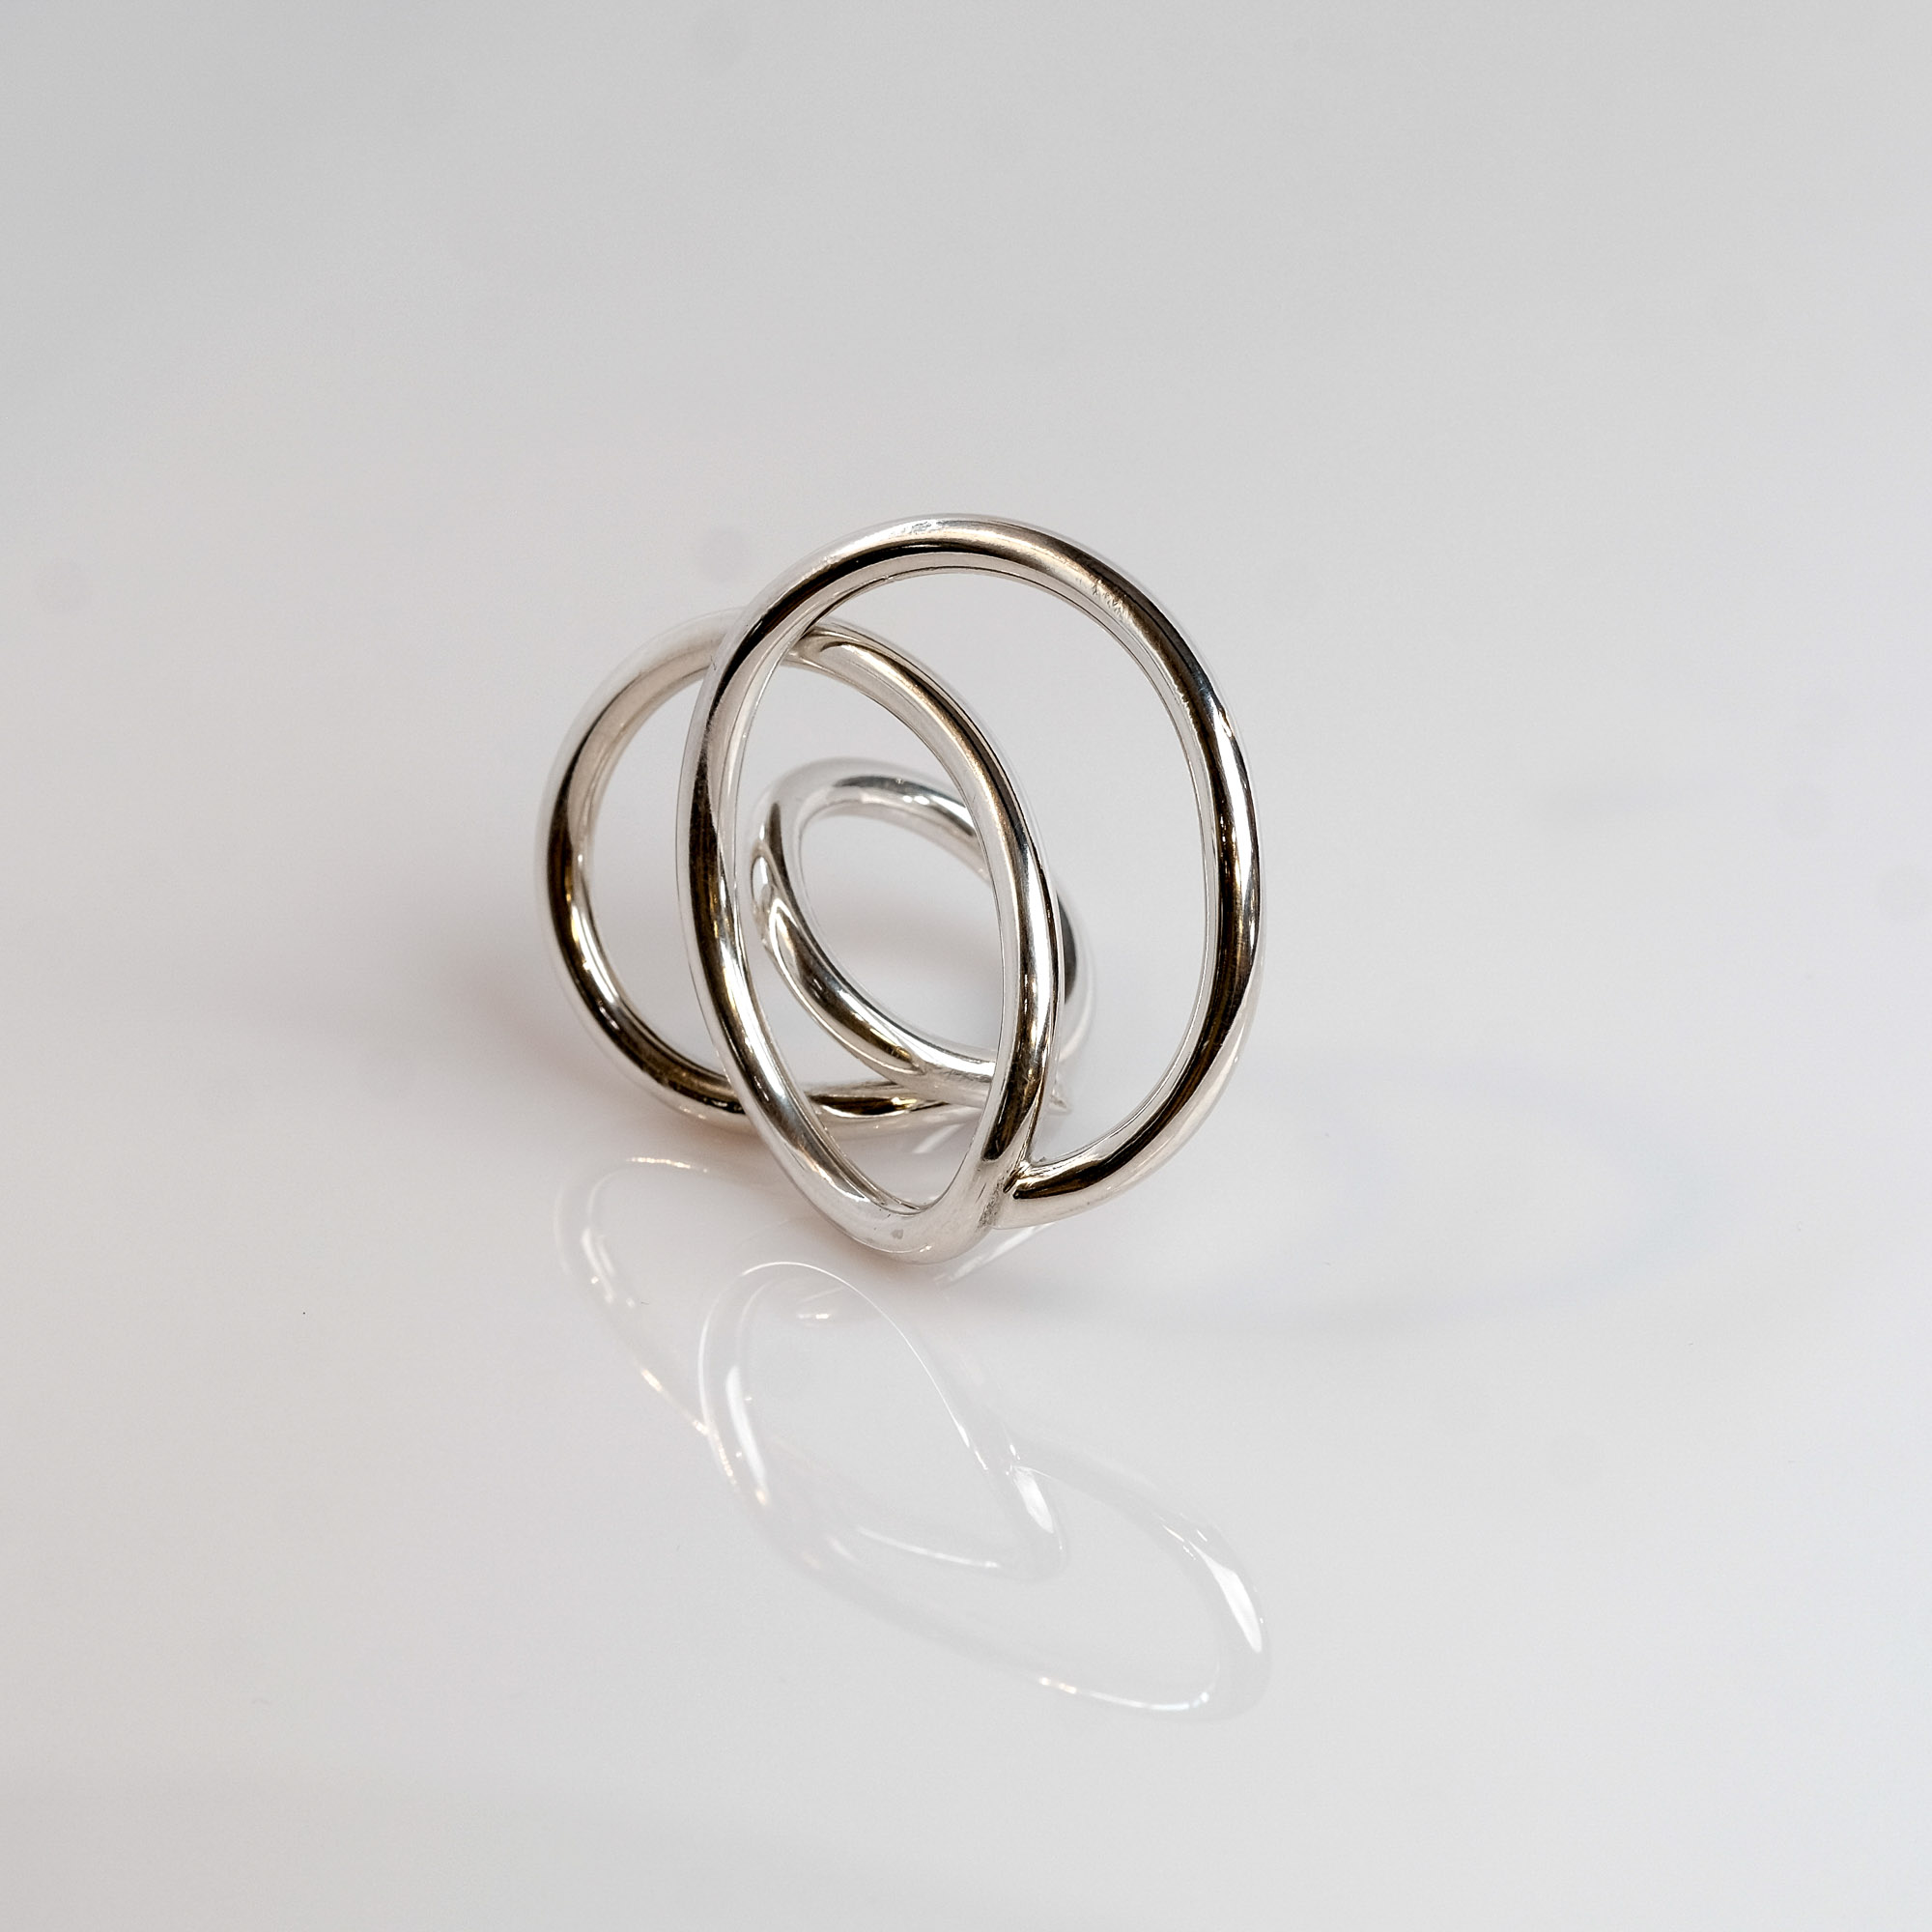 Pris: dkk 1450 Stor smuk snoet ring